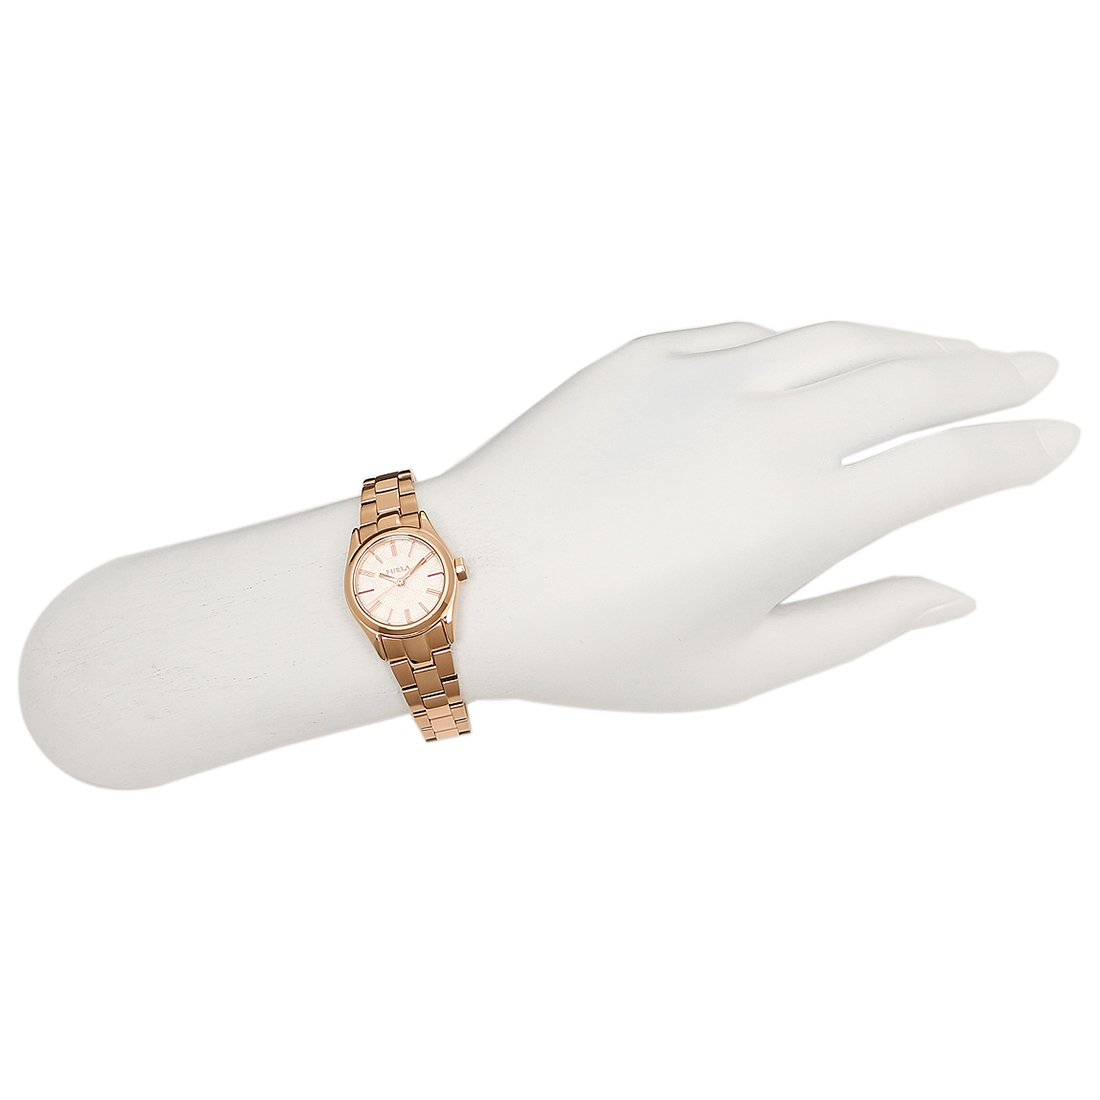 abec76d6a1ab Amazon | [フルラ] 腕時計 レディース FURLA 899314 R4253101522 W485 MT0 00Z 1G0 ローズゴールド  シルバー [並行輸入品] | 並行輸入品・逆輸入品・中古品( ...